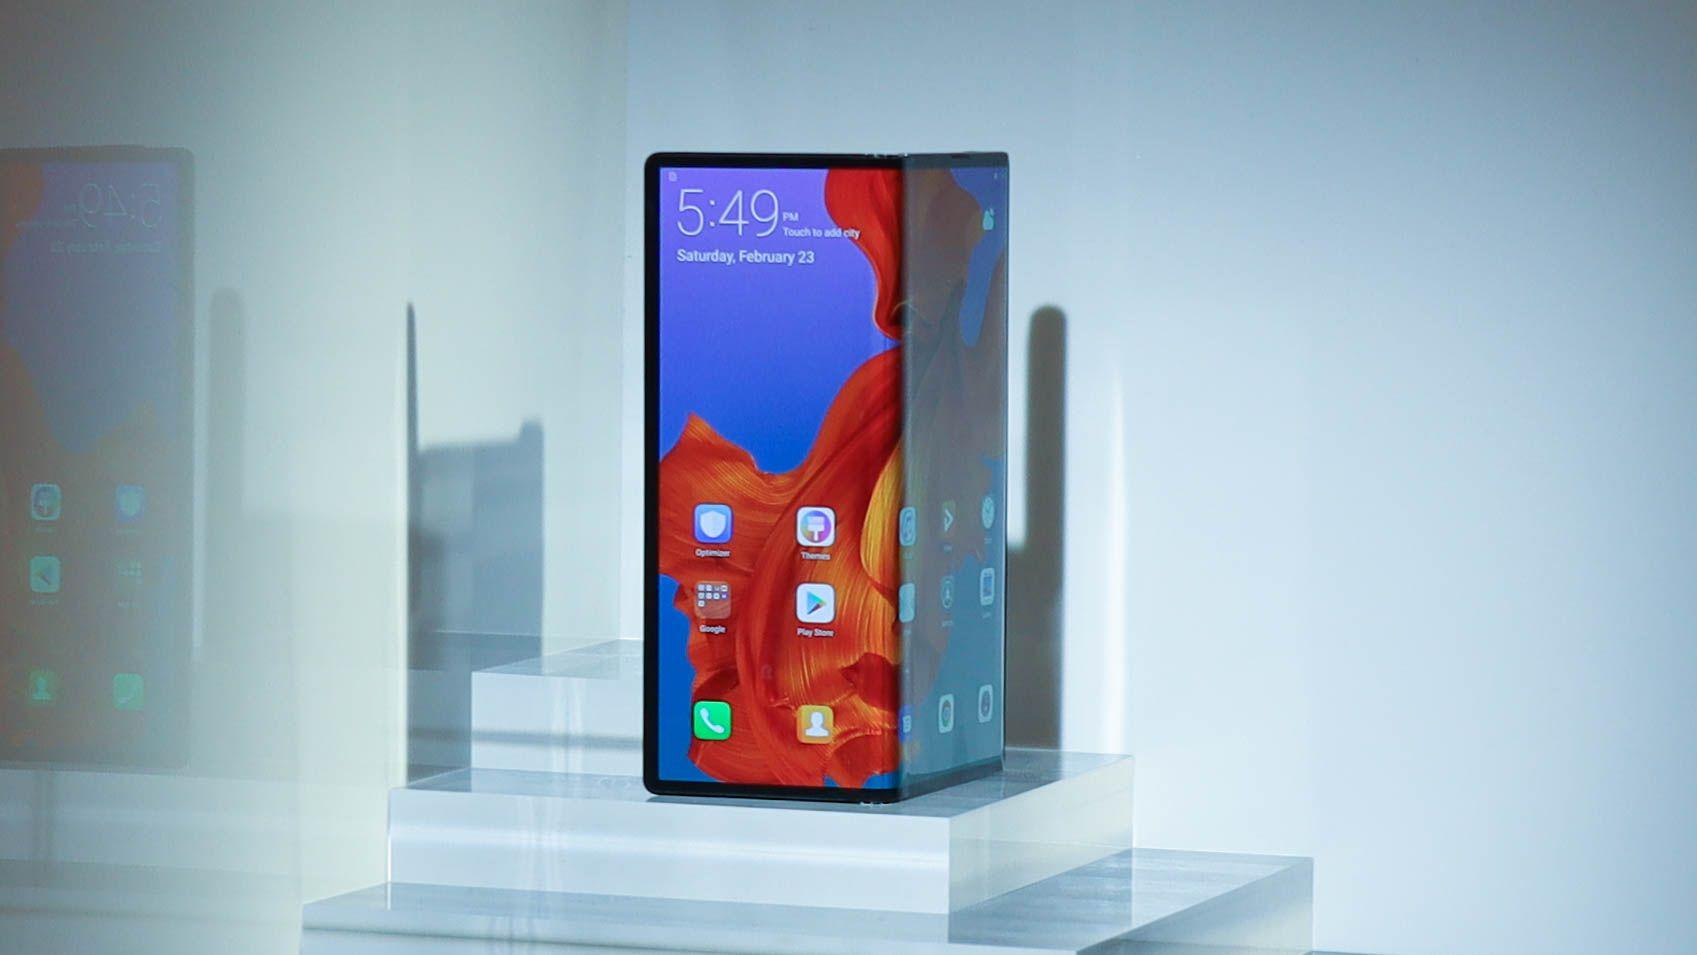 Galaxy Fold Vs Huawei Mate X Battle Of The Foldable Phones Huawei Mate Phone Smartphone